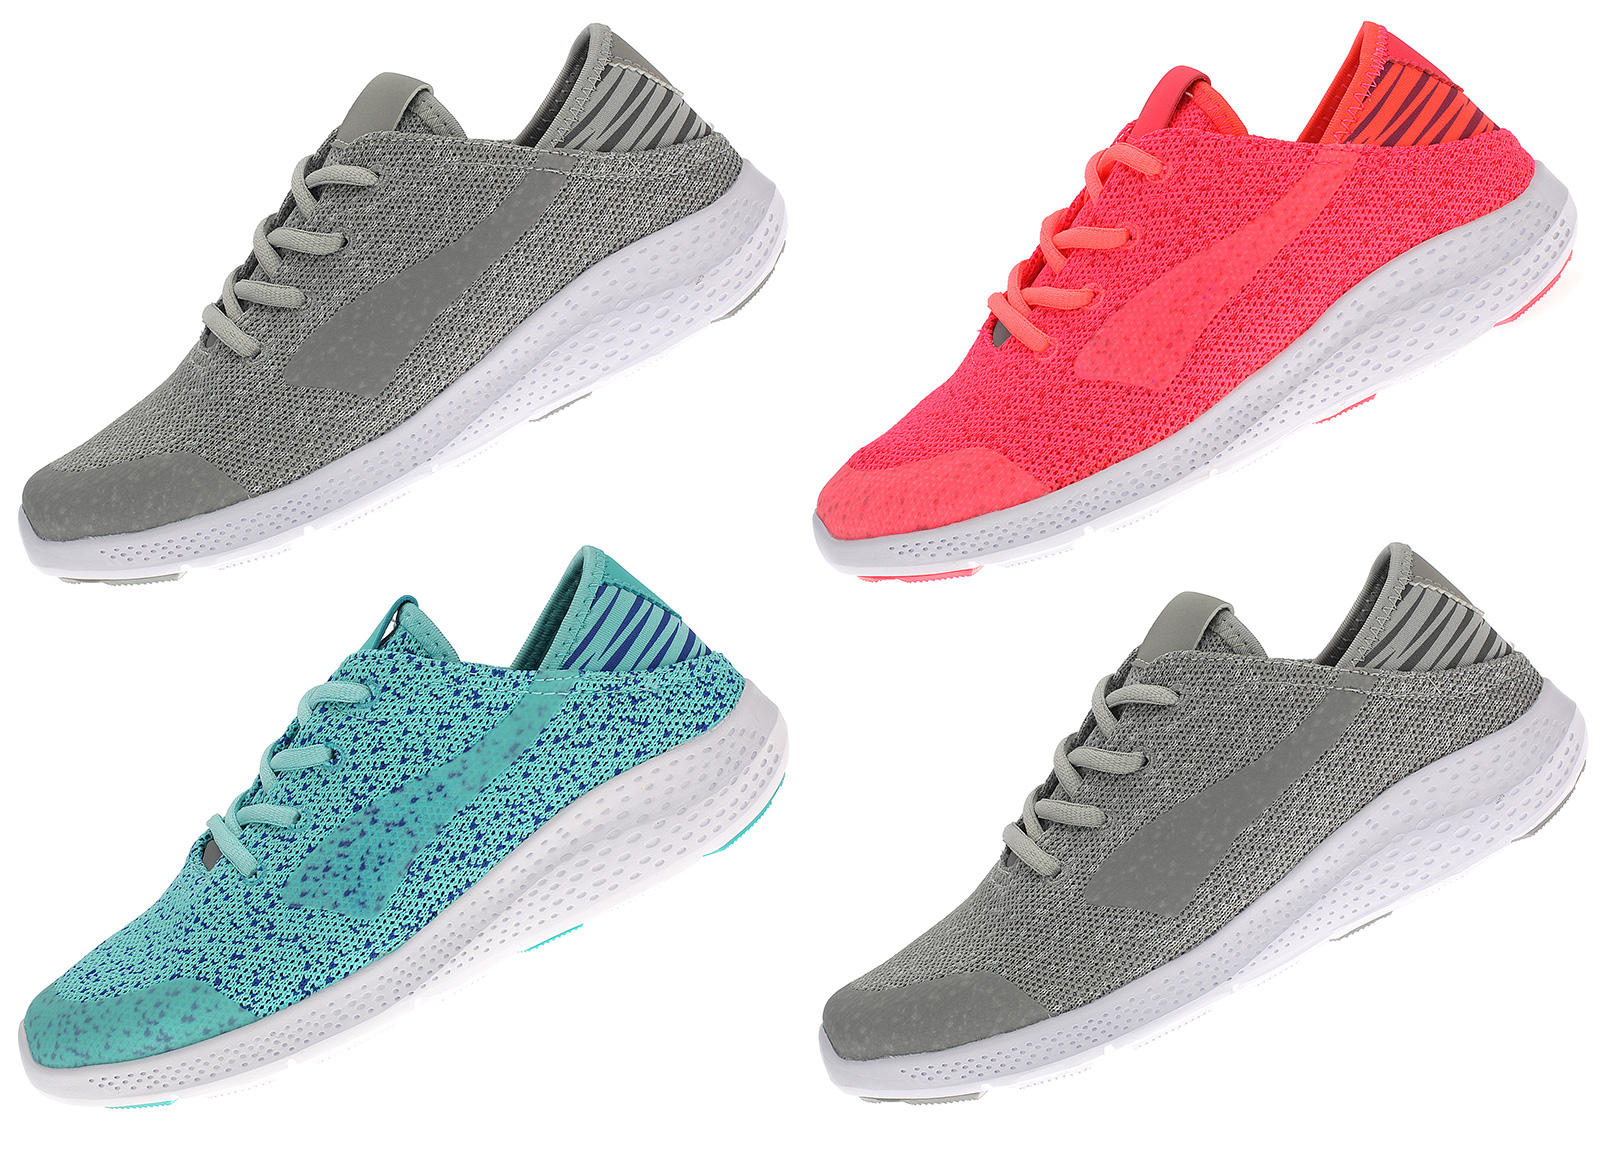 Damen Sneaker 36 37 38 39 40 41 Sportschuhe Turnschuhe Freizeit Laufschuhe 6317